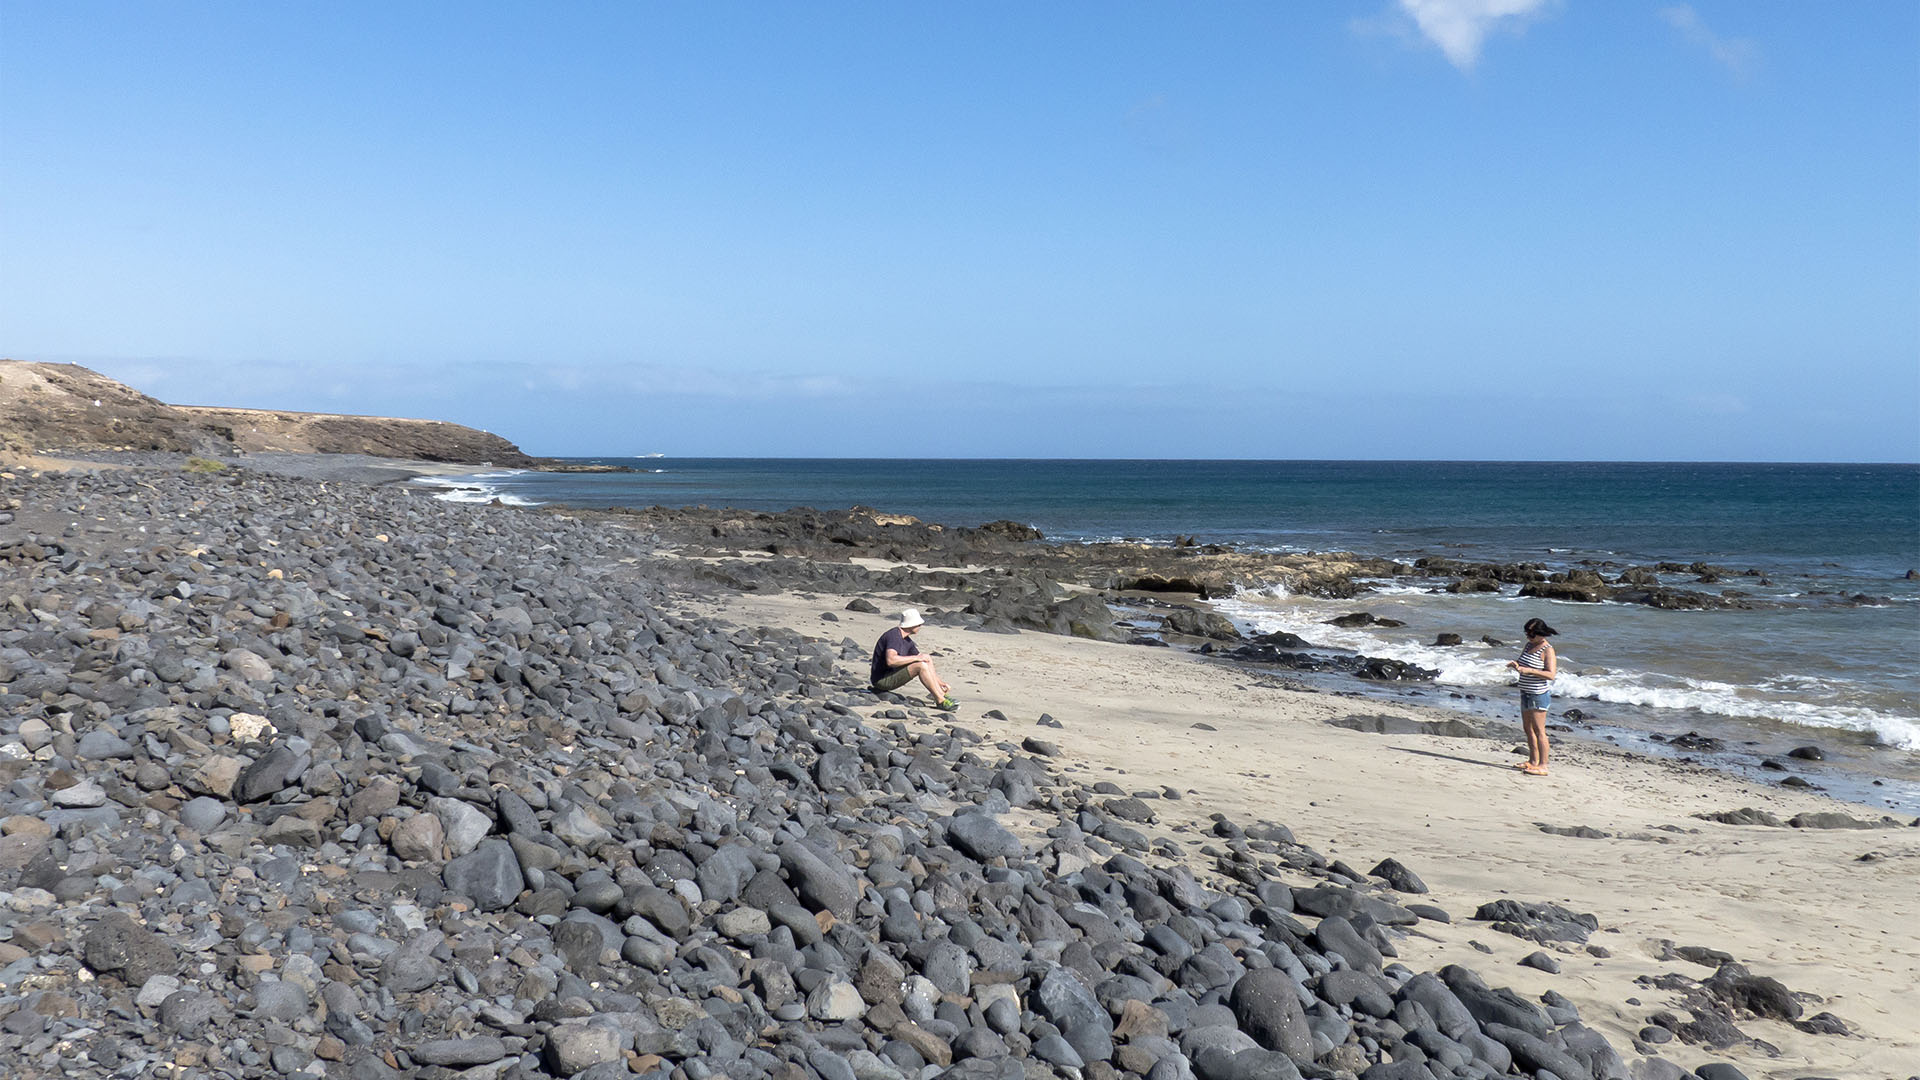 Strände Fuerteventura Ostküste: Playa de las Pilas aka Playa la Rajita.